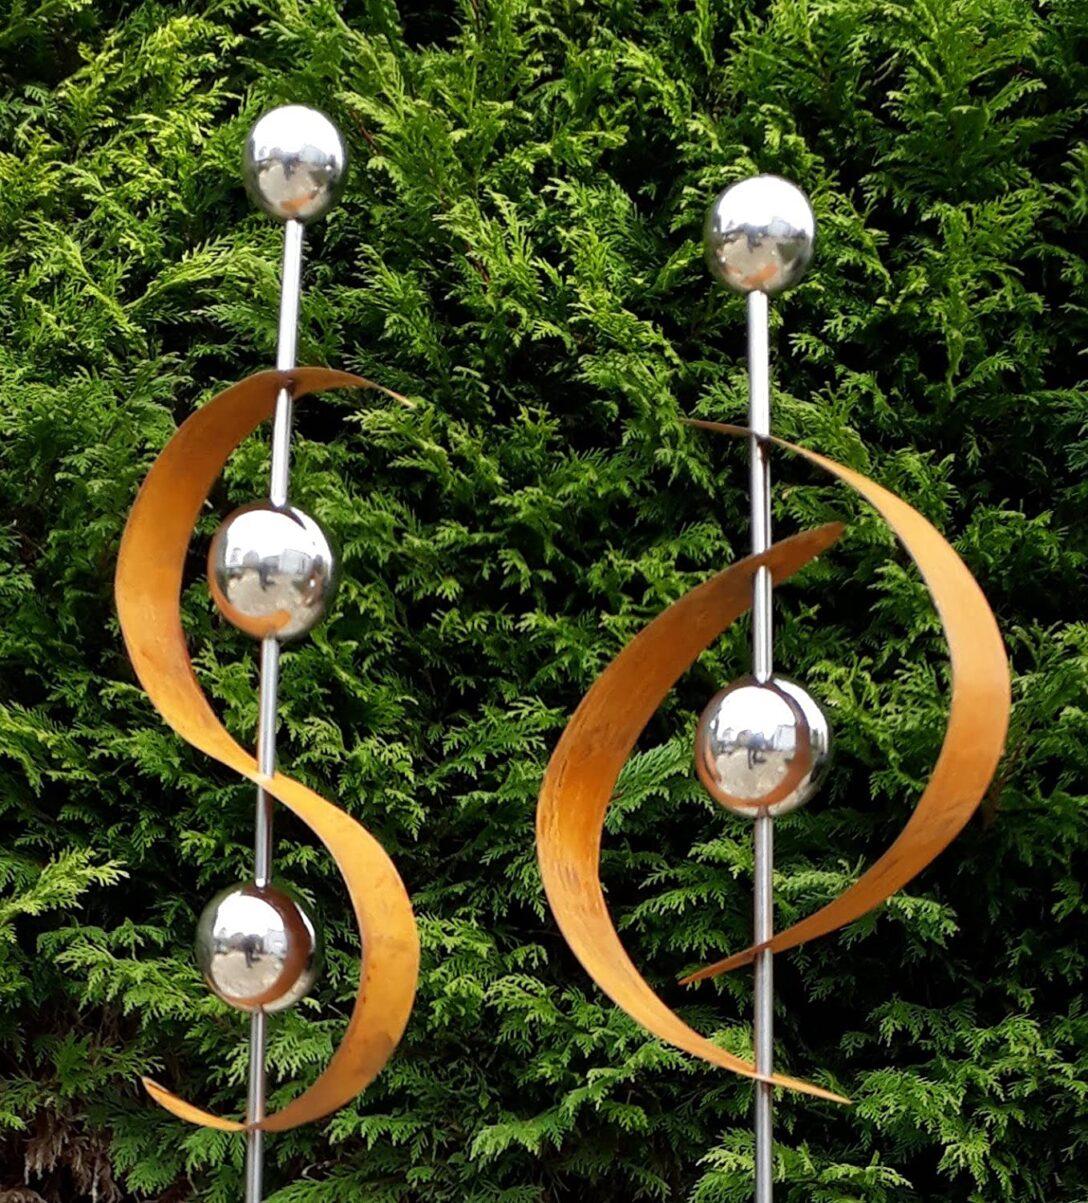 Large Size of Gartendeko Modern Pinterest Online Moderne Kaufen Skulpturen Rost Selber Machen Metall Edelstahl Art 2er Set Gartenstecker Edelrost M Kugel Bett Design Wohnzimmer Gartendeko Modern